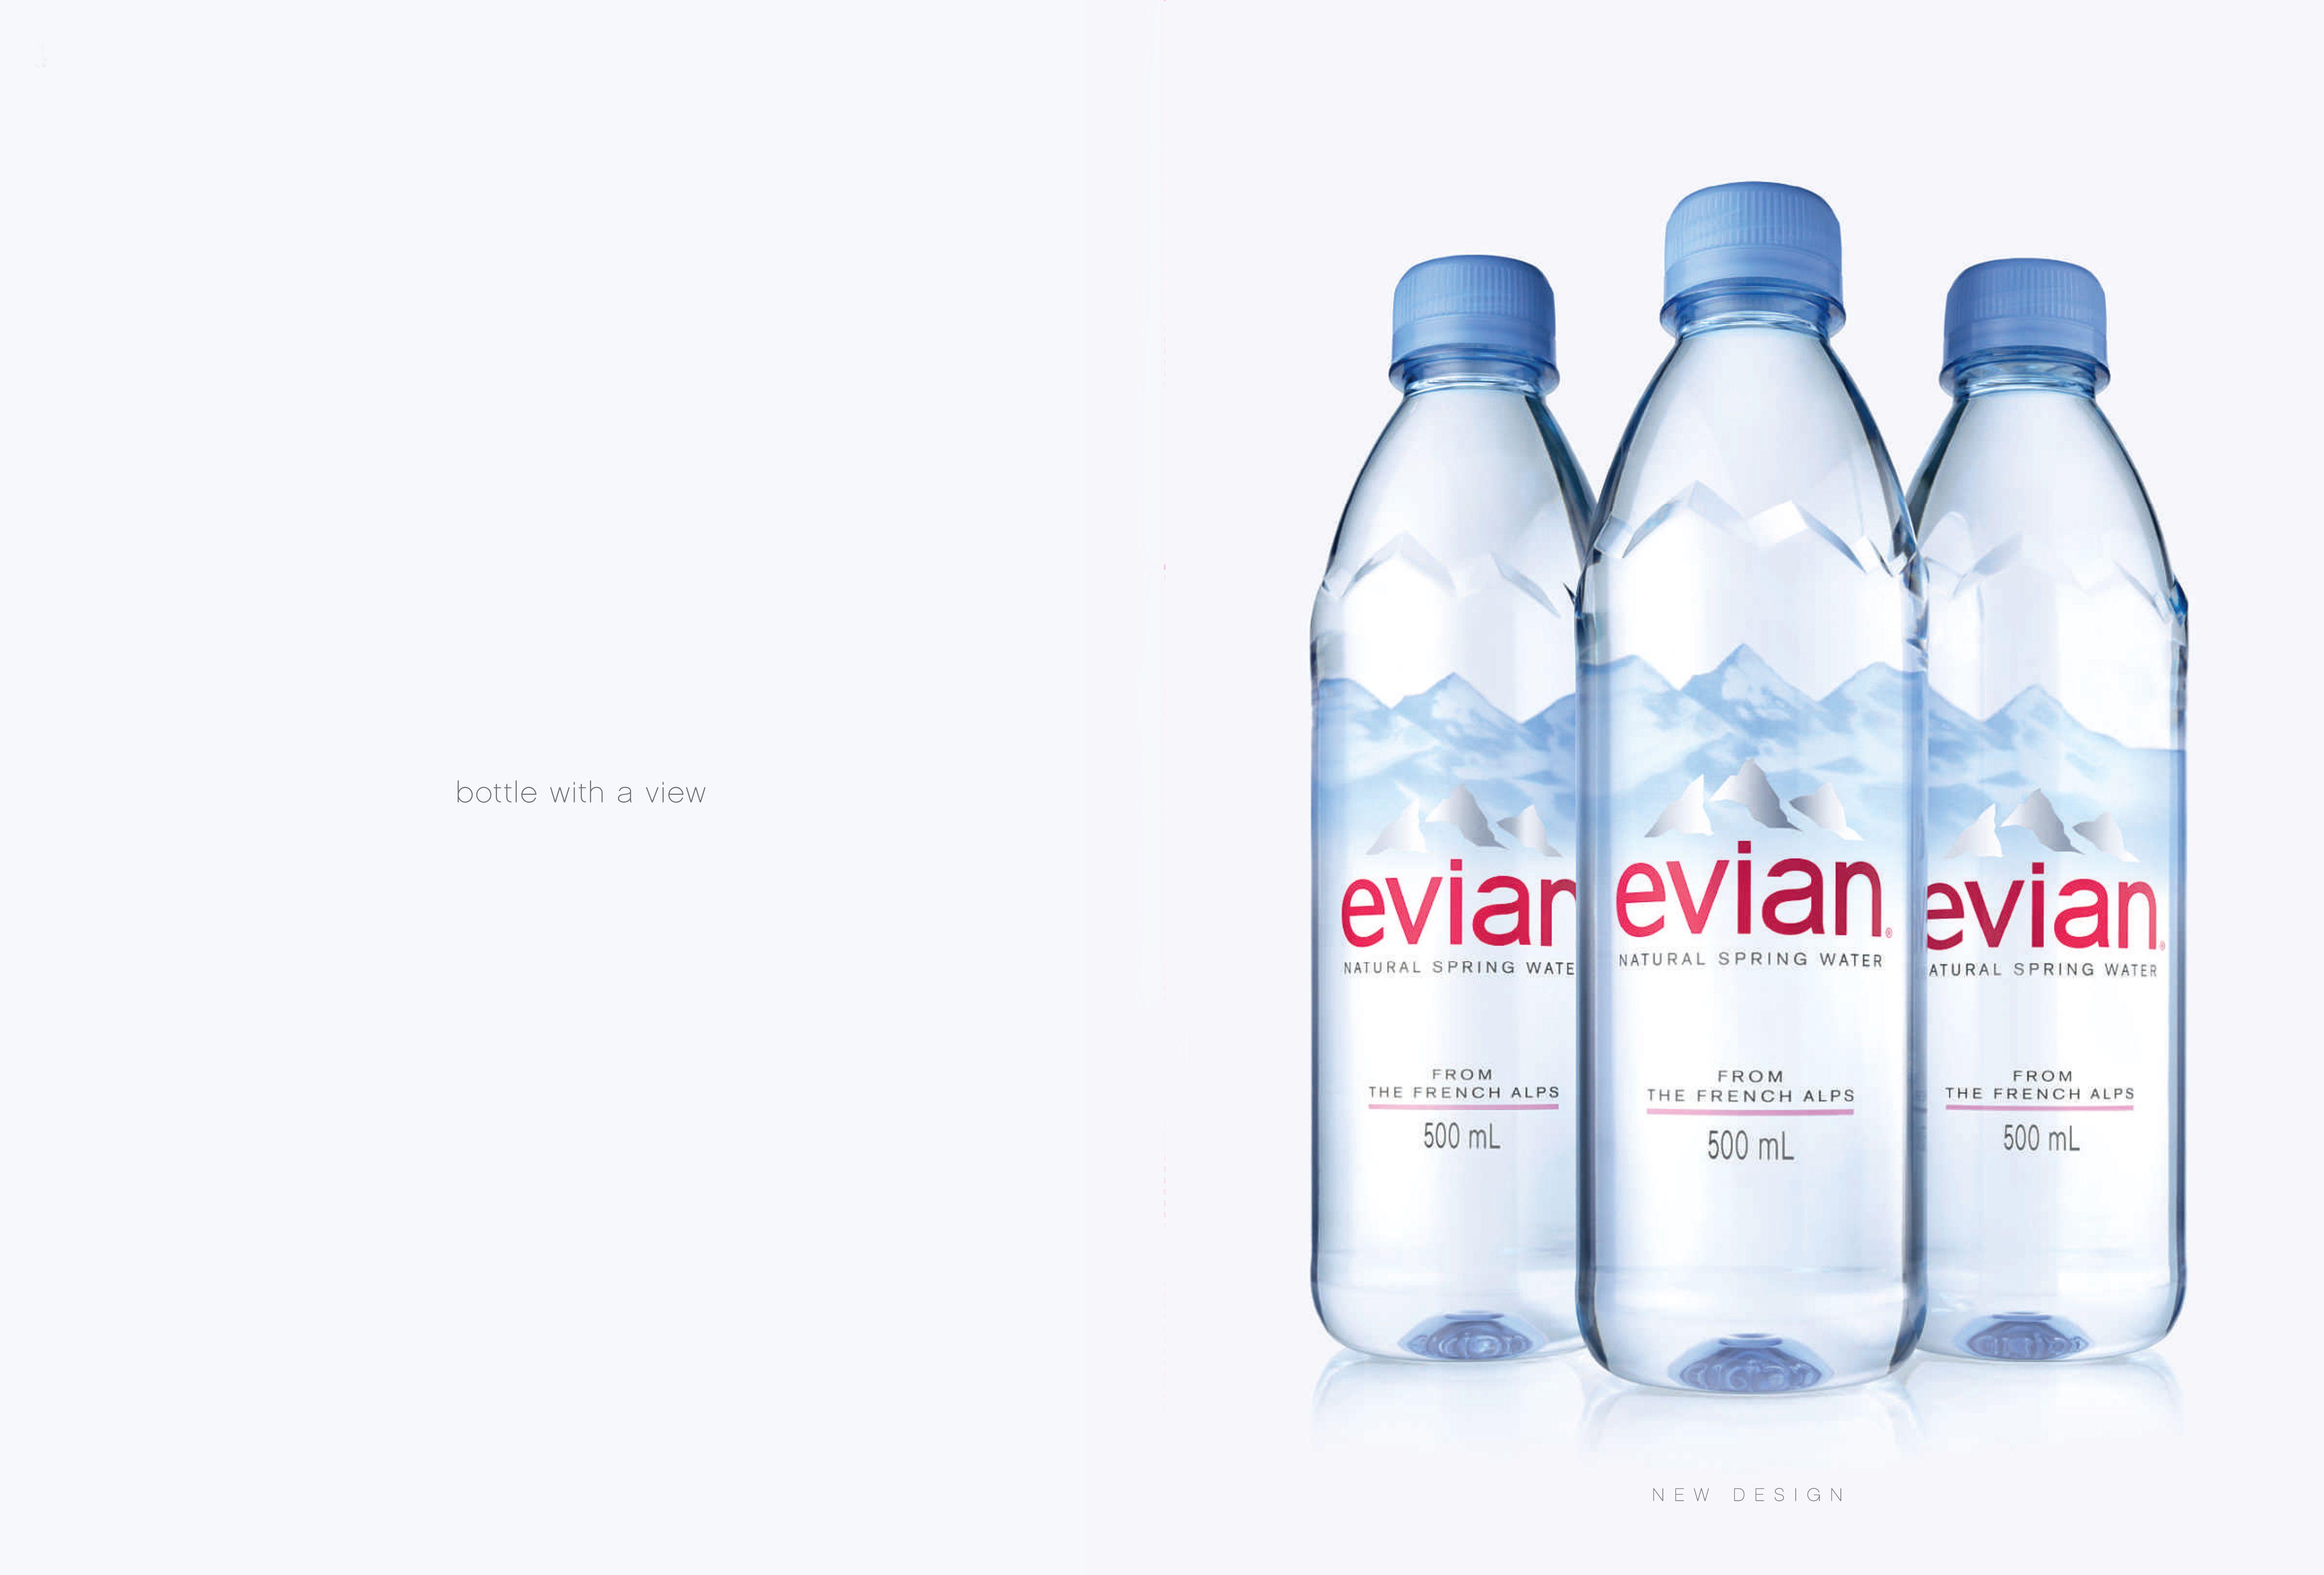 Richard Pierce CA1CA2 Evian '13 Follow us on